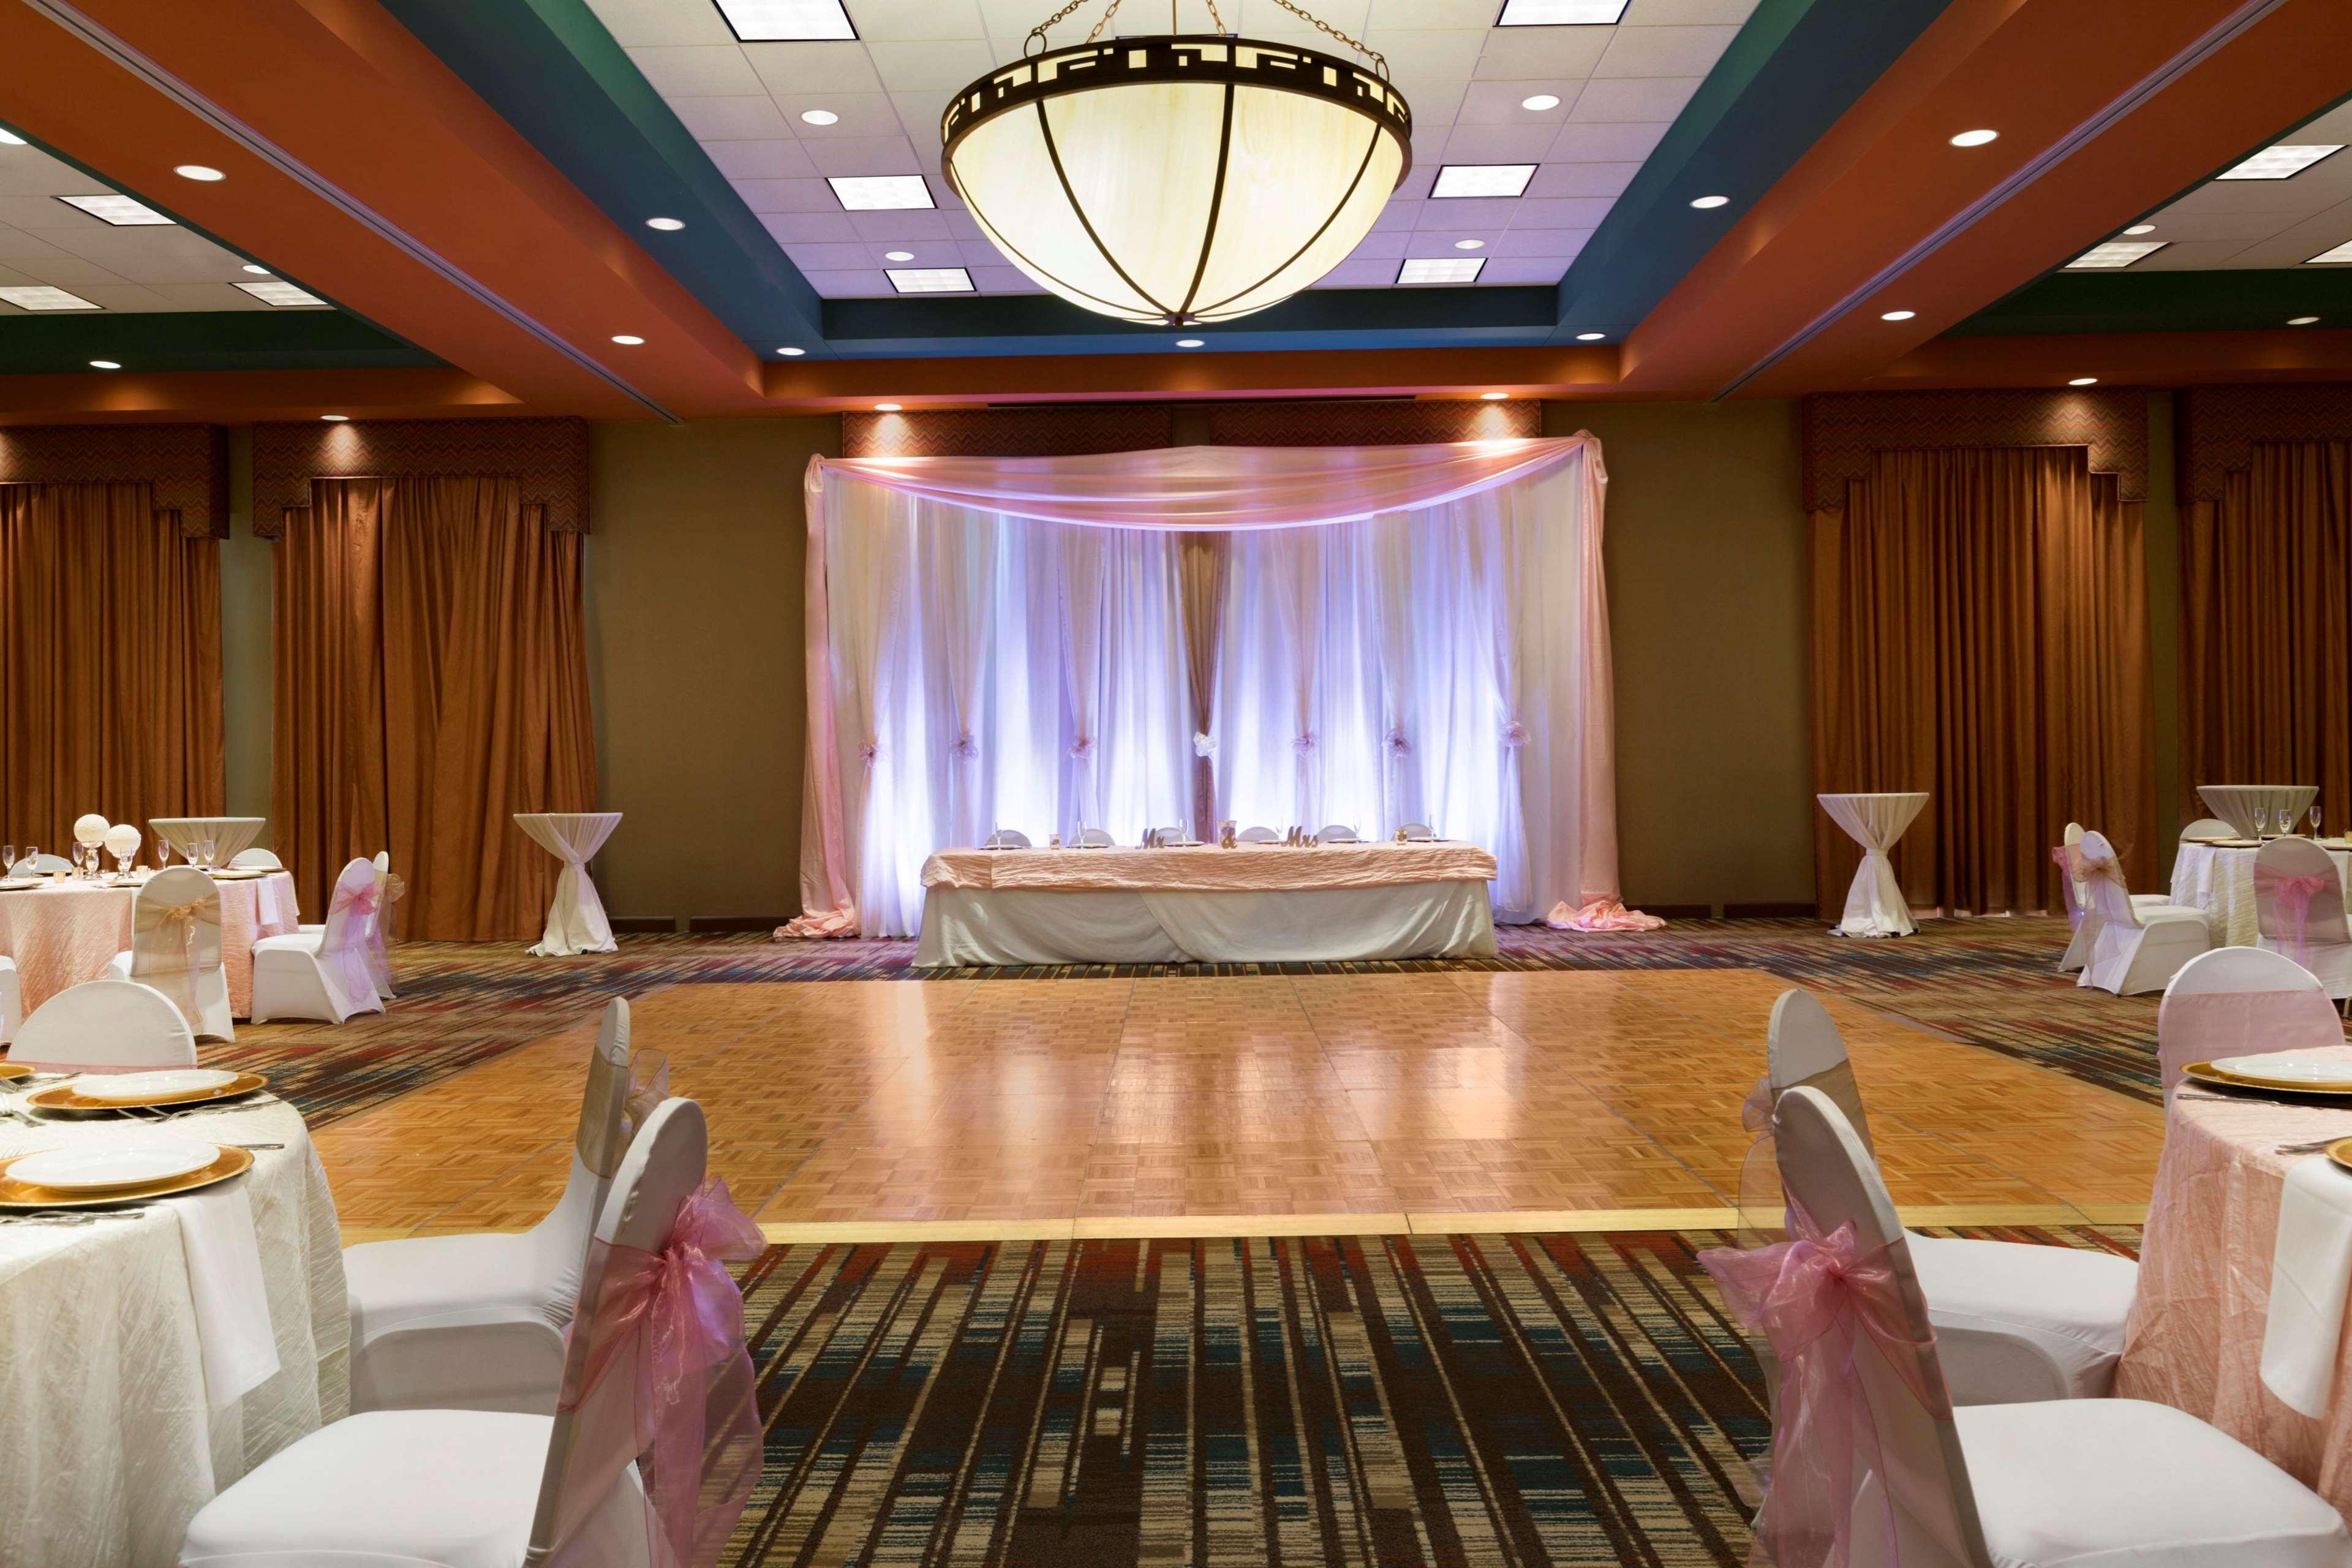 Embassy Suites by Hilton Albuquerque Hotel & Spa image 36